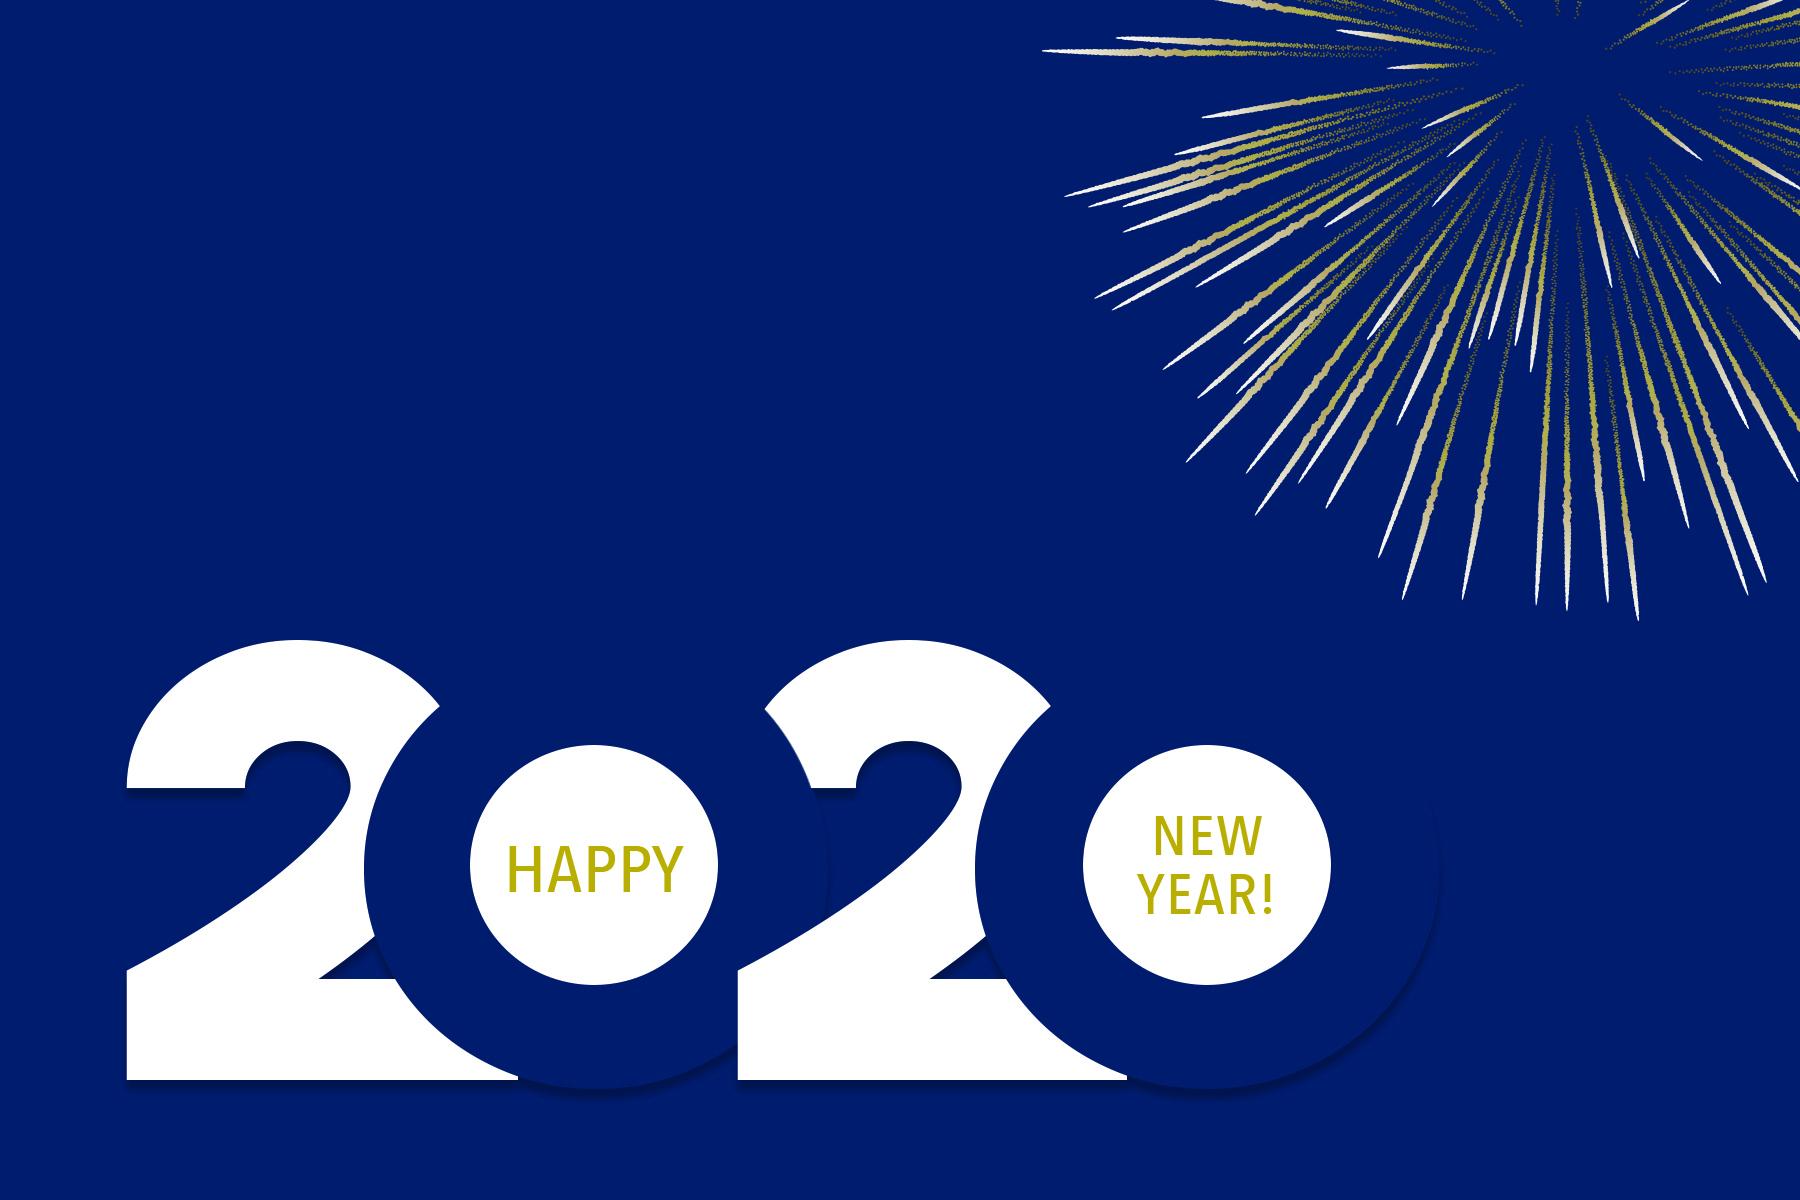 2020 New Year's Eve Celebrations In Savannah Georgia